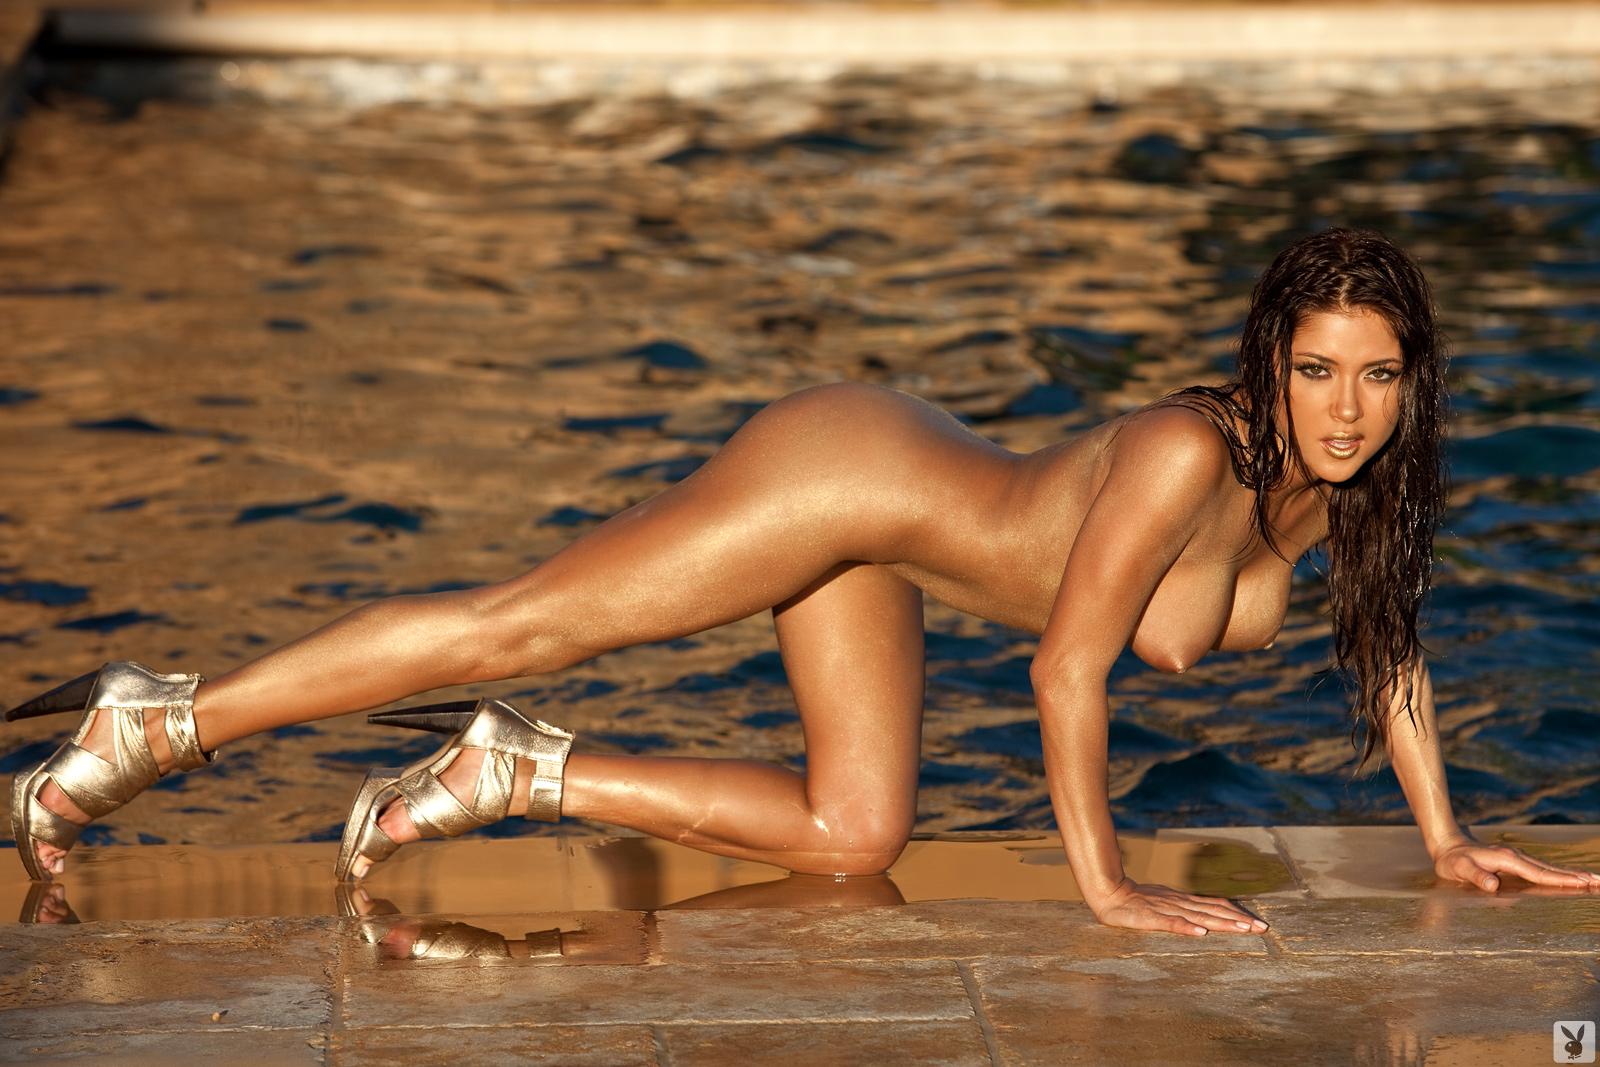 Ufc ring girls nude look